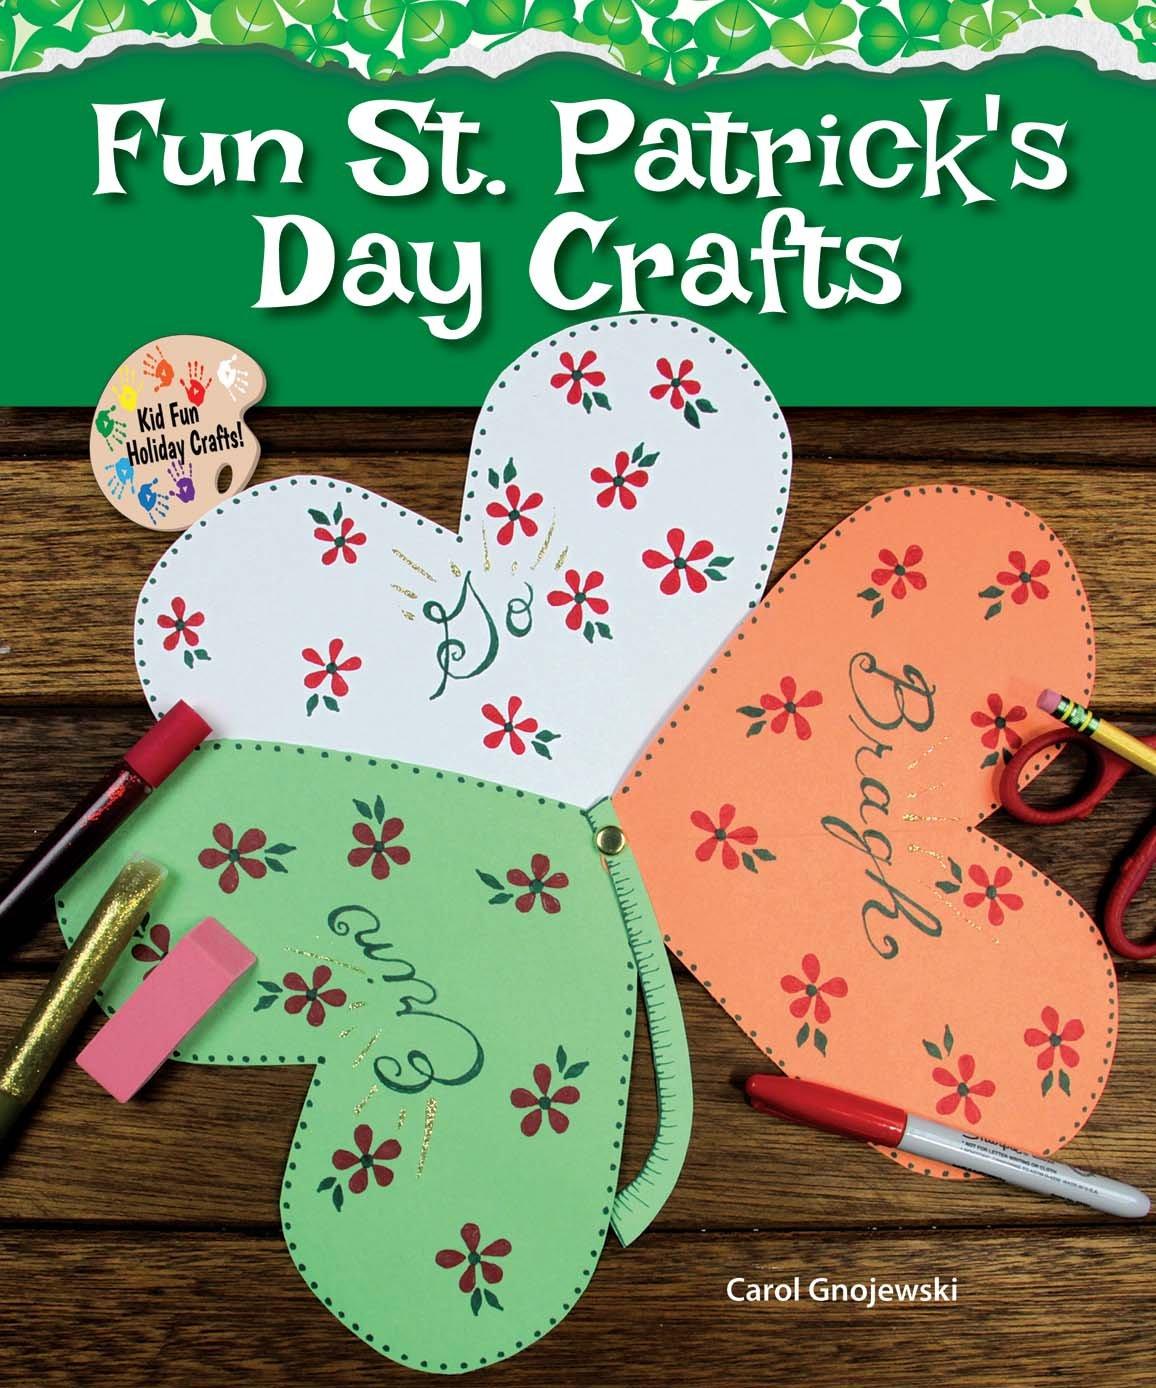 Fun St. Patrick's Day Crafts (Kid Fun Holiday Crafts!)